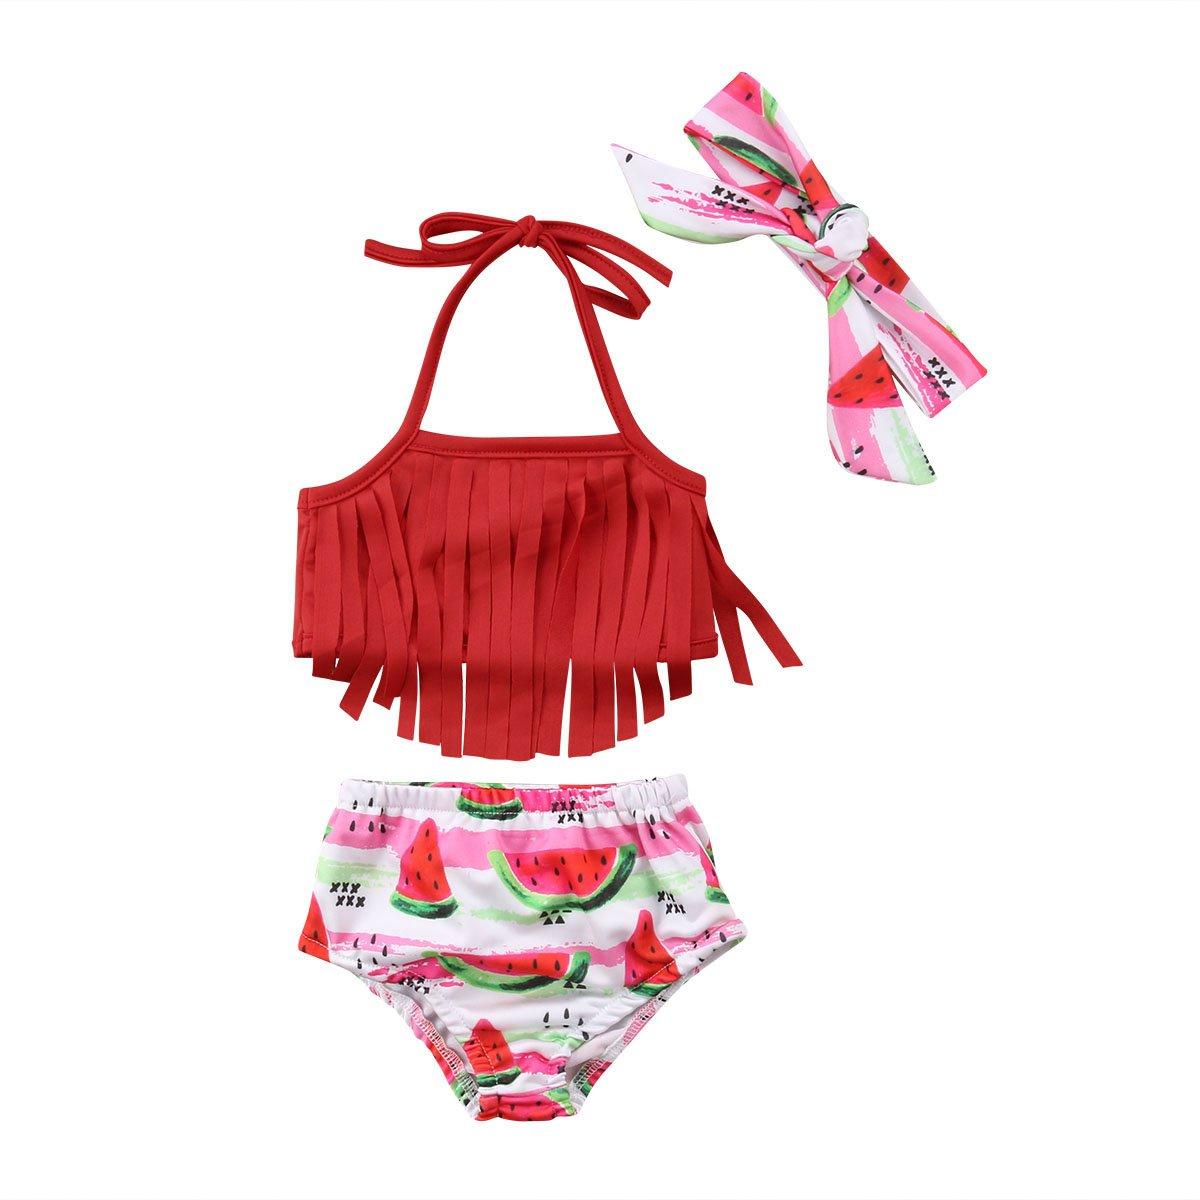 ea9b4b837b51 Toddler Kid Baby Girls Swimsuit Bikini Set Tassel Swimming Tops Fruit  Watermelon Shorts Girl Headband Swimwear Bathing Suit – Beal | Daily Deals  For Moms